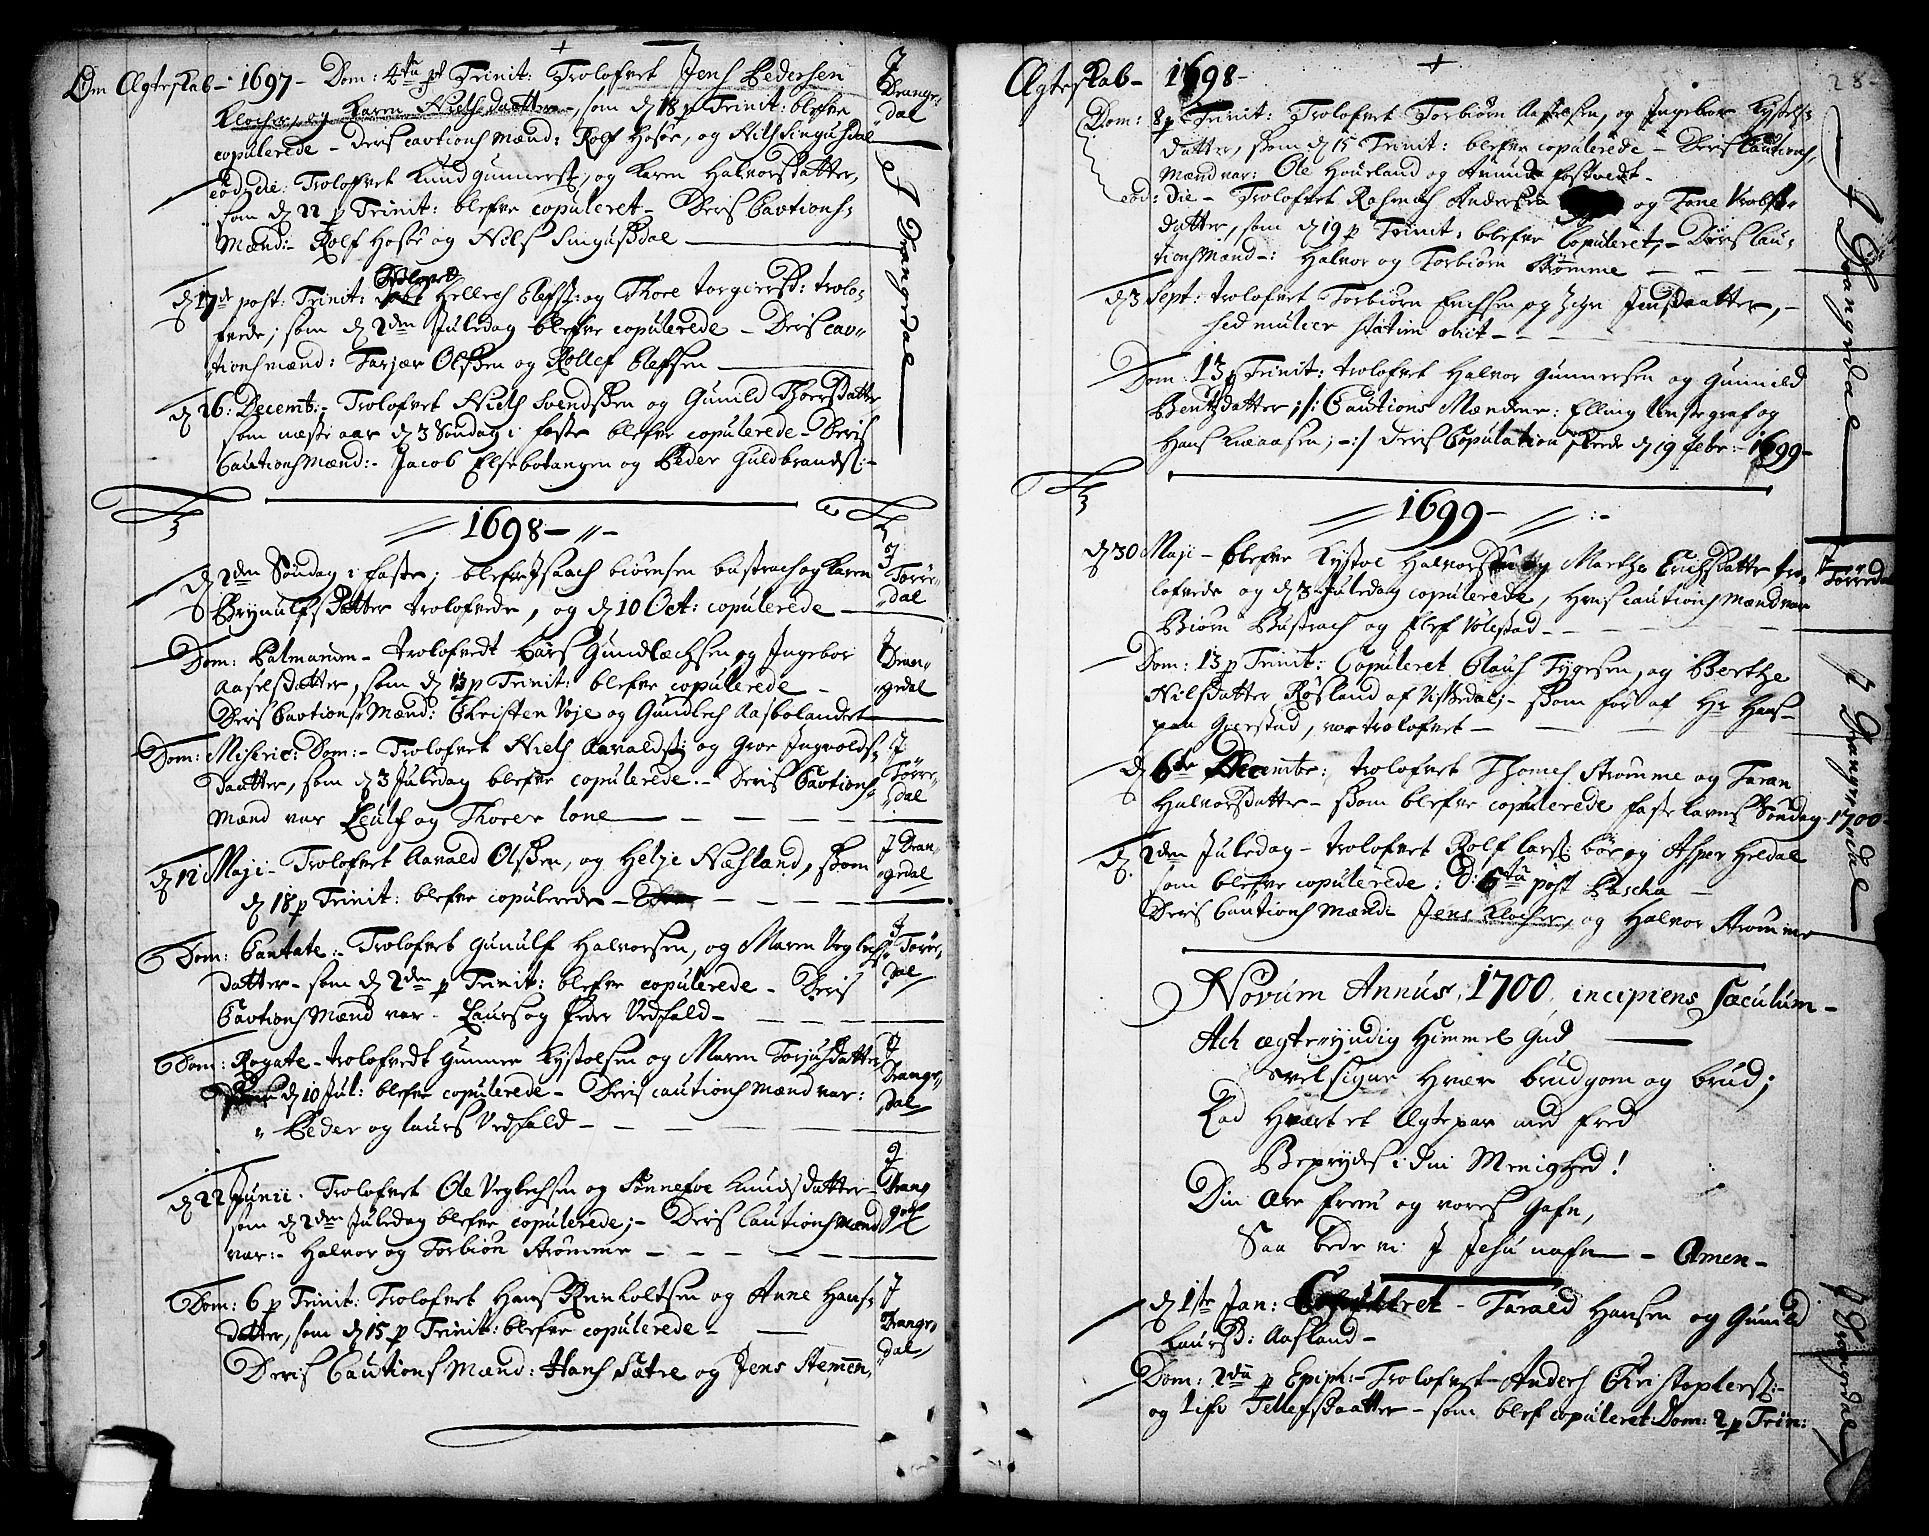 SAKO, Drangedal kirkebøker, F/Fa/L0001: Ministerialbok nr. 1, 1697-1767, s. 28